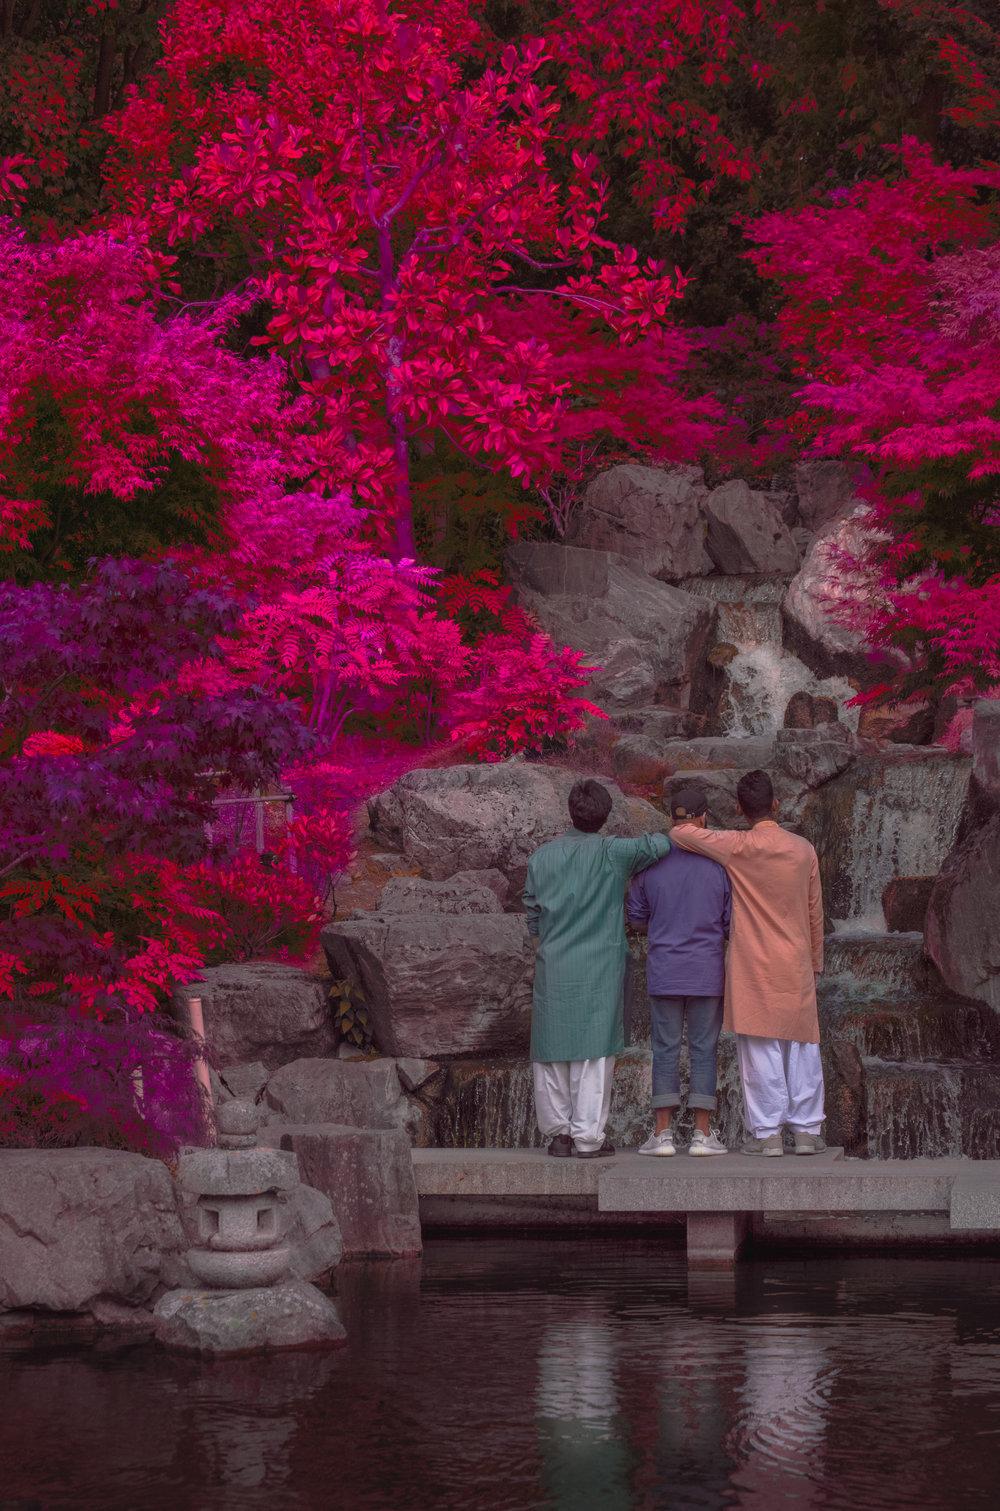 kyoto gardens red leaves 1.jpg